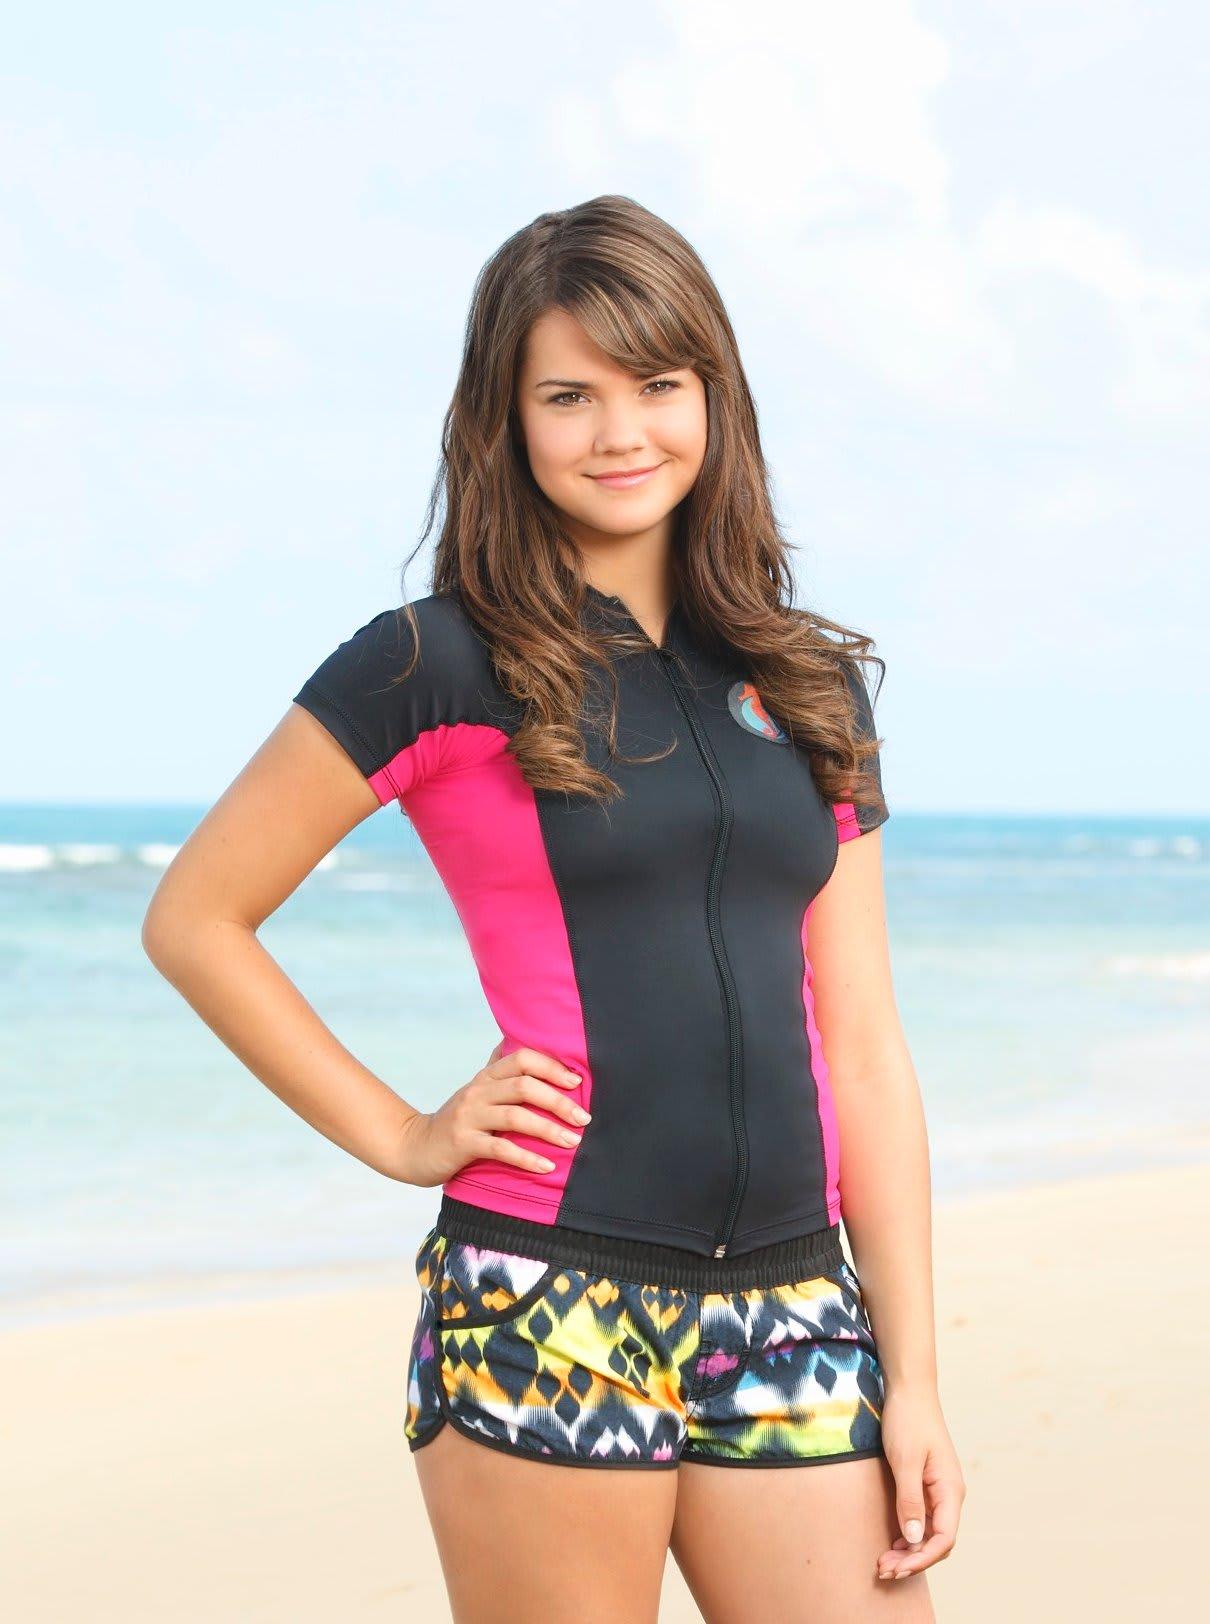 Maia Mitchell - Teen Beach Movie promo shoot - ☆Favorite